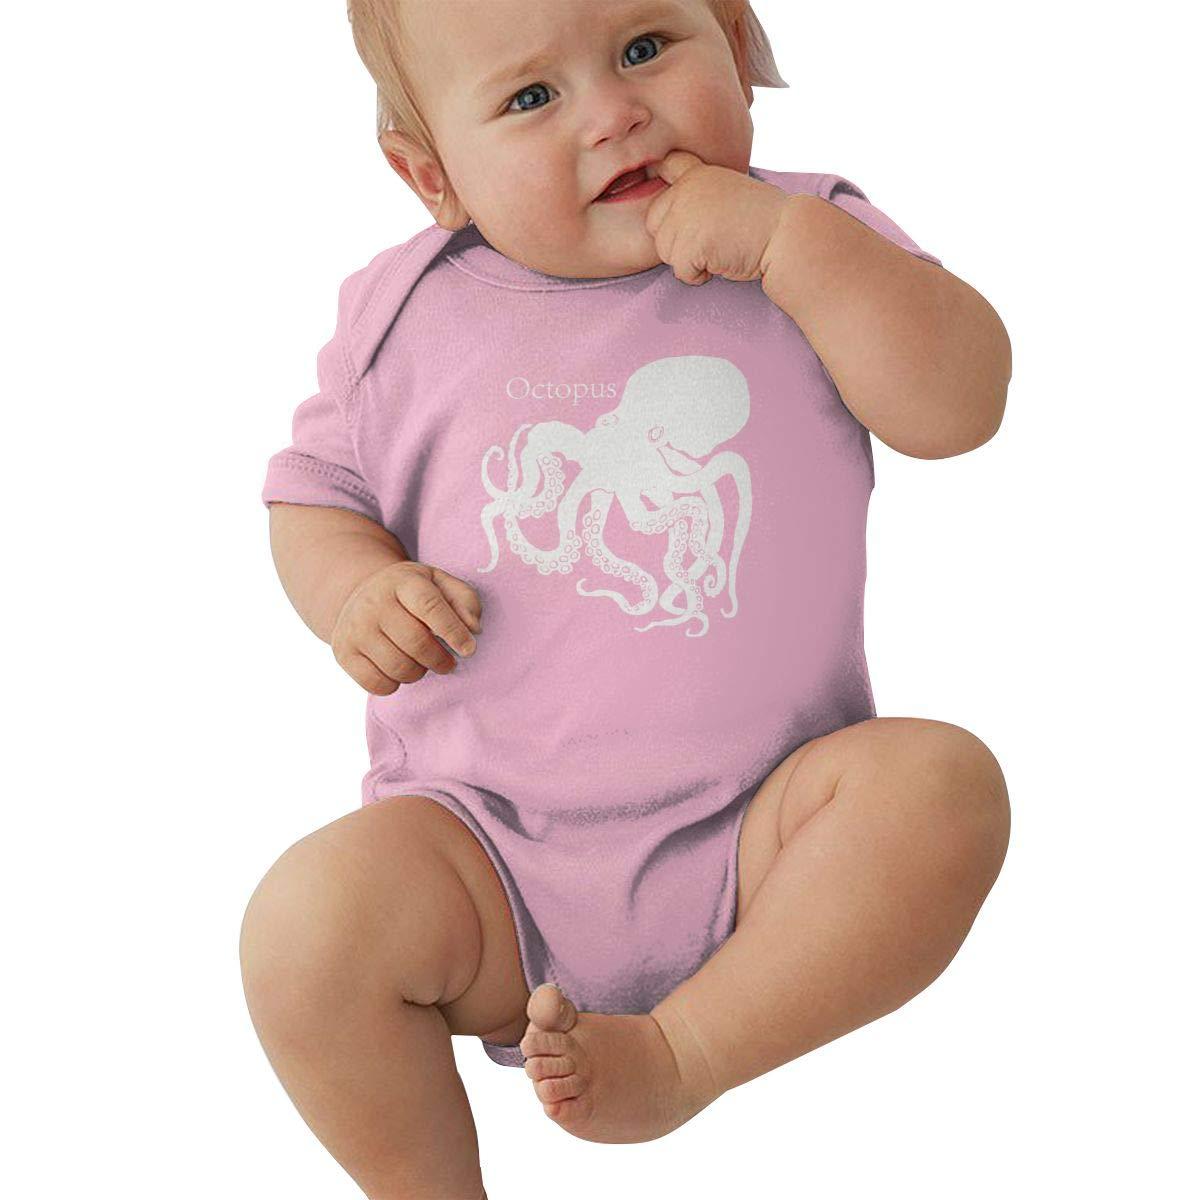 Infant Baby Girl Boy Octopus RomperRomper Jumpsuit Short Sleeve Bodysuit Tops Clothes